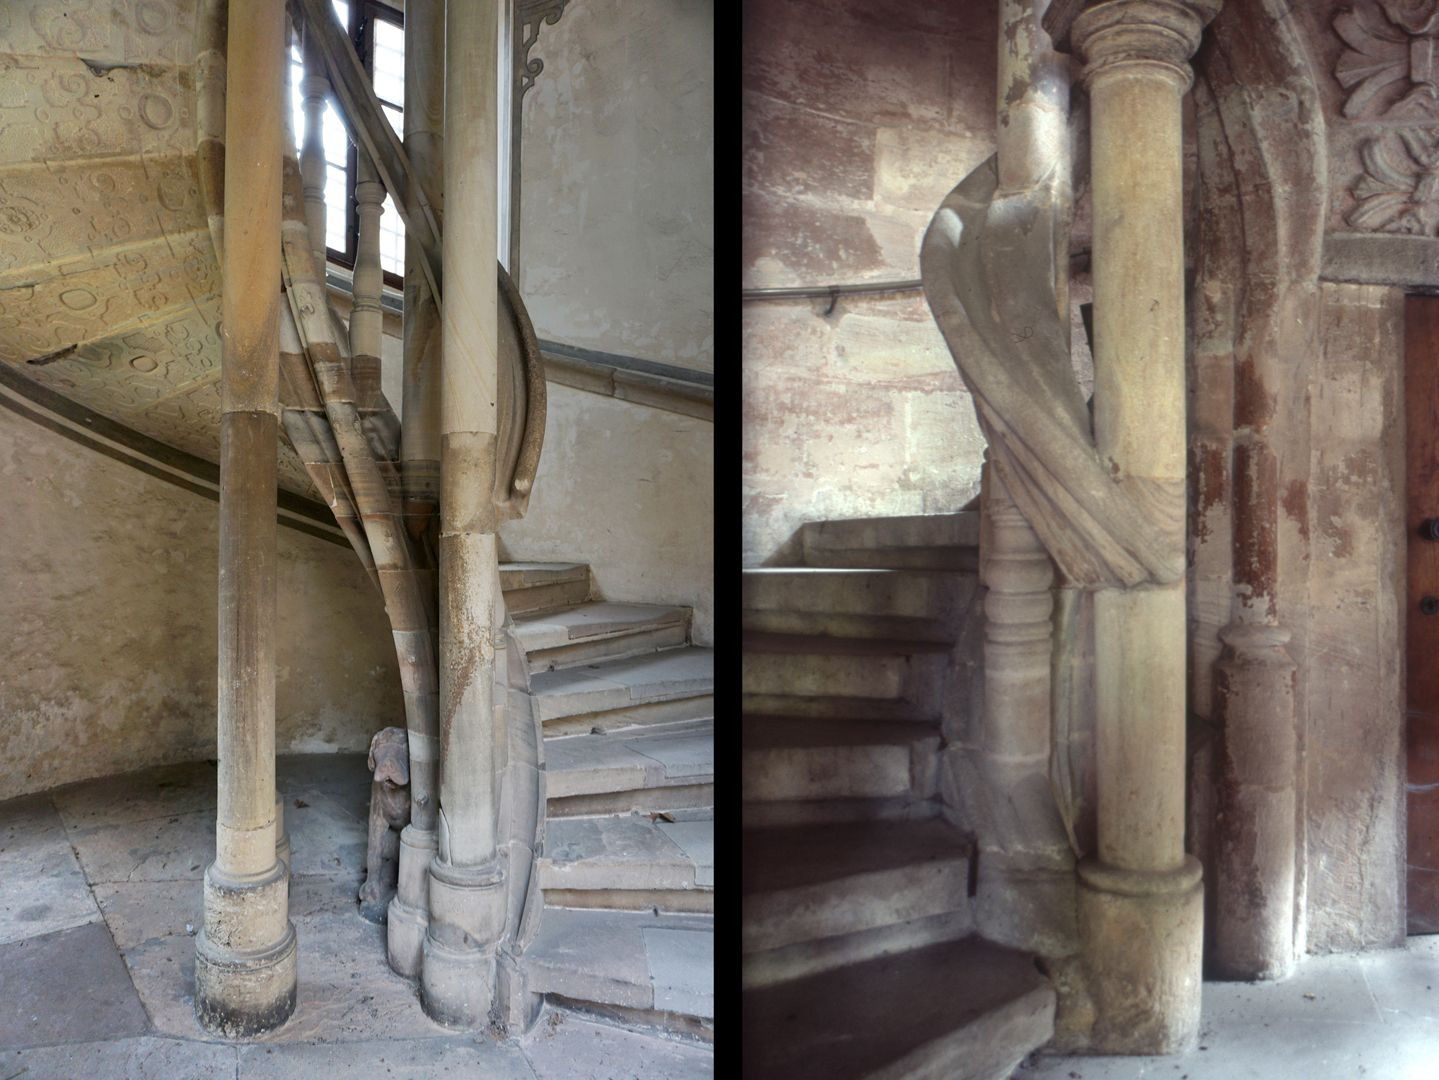 Treppentyp / Pellerhaus links Straßburg, rechts Nürnberg: Treppenaufgang im Vergleich, Straßburg linkswendig, Nürnberg rechtswendig